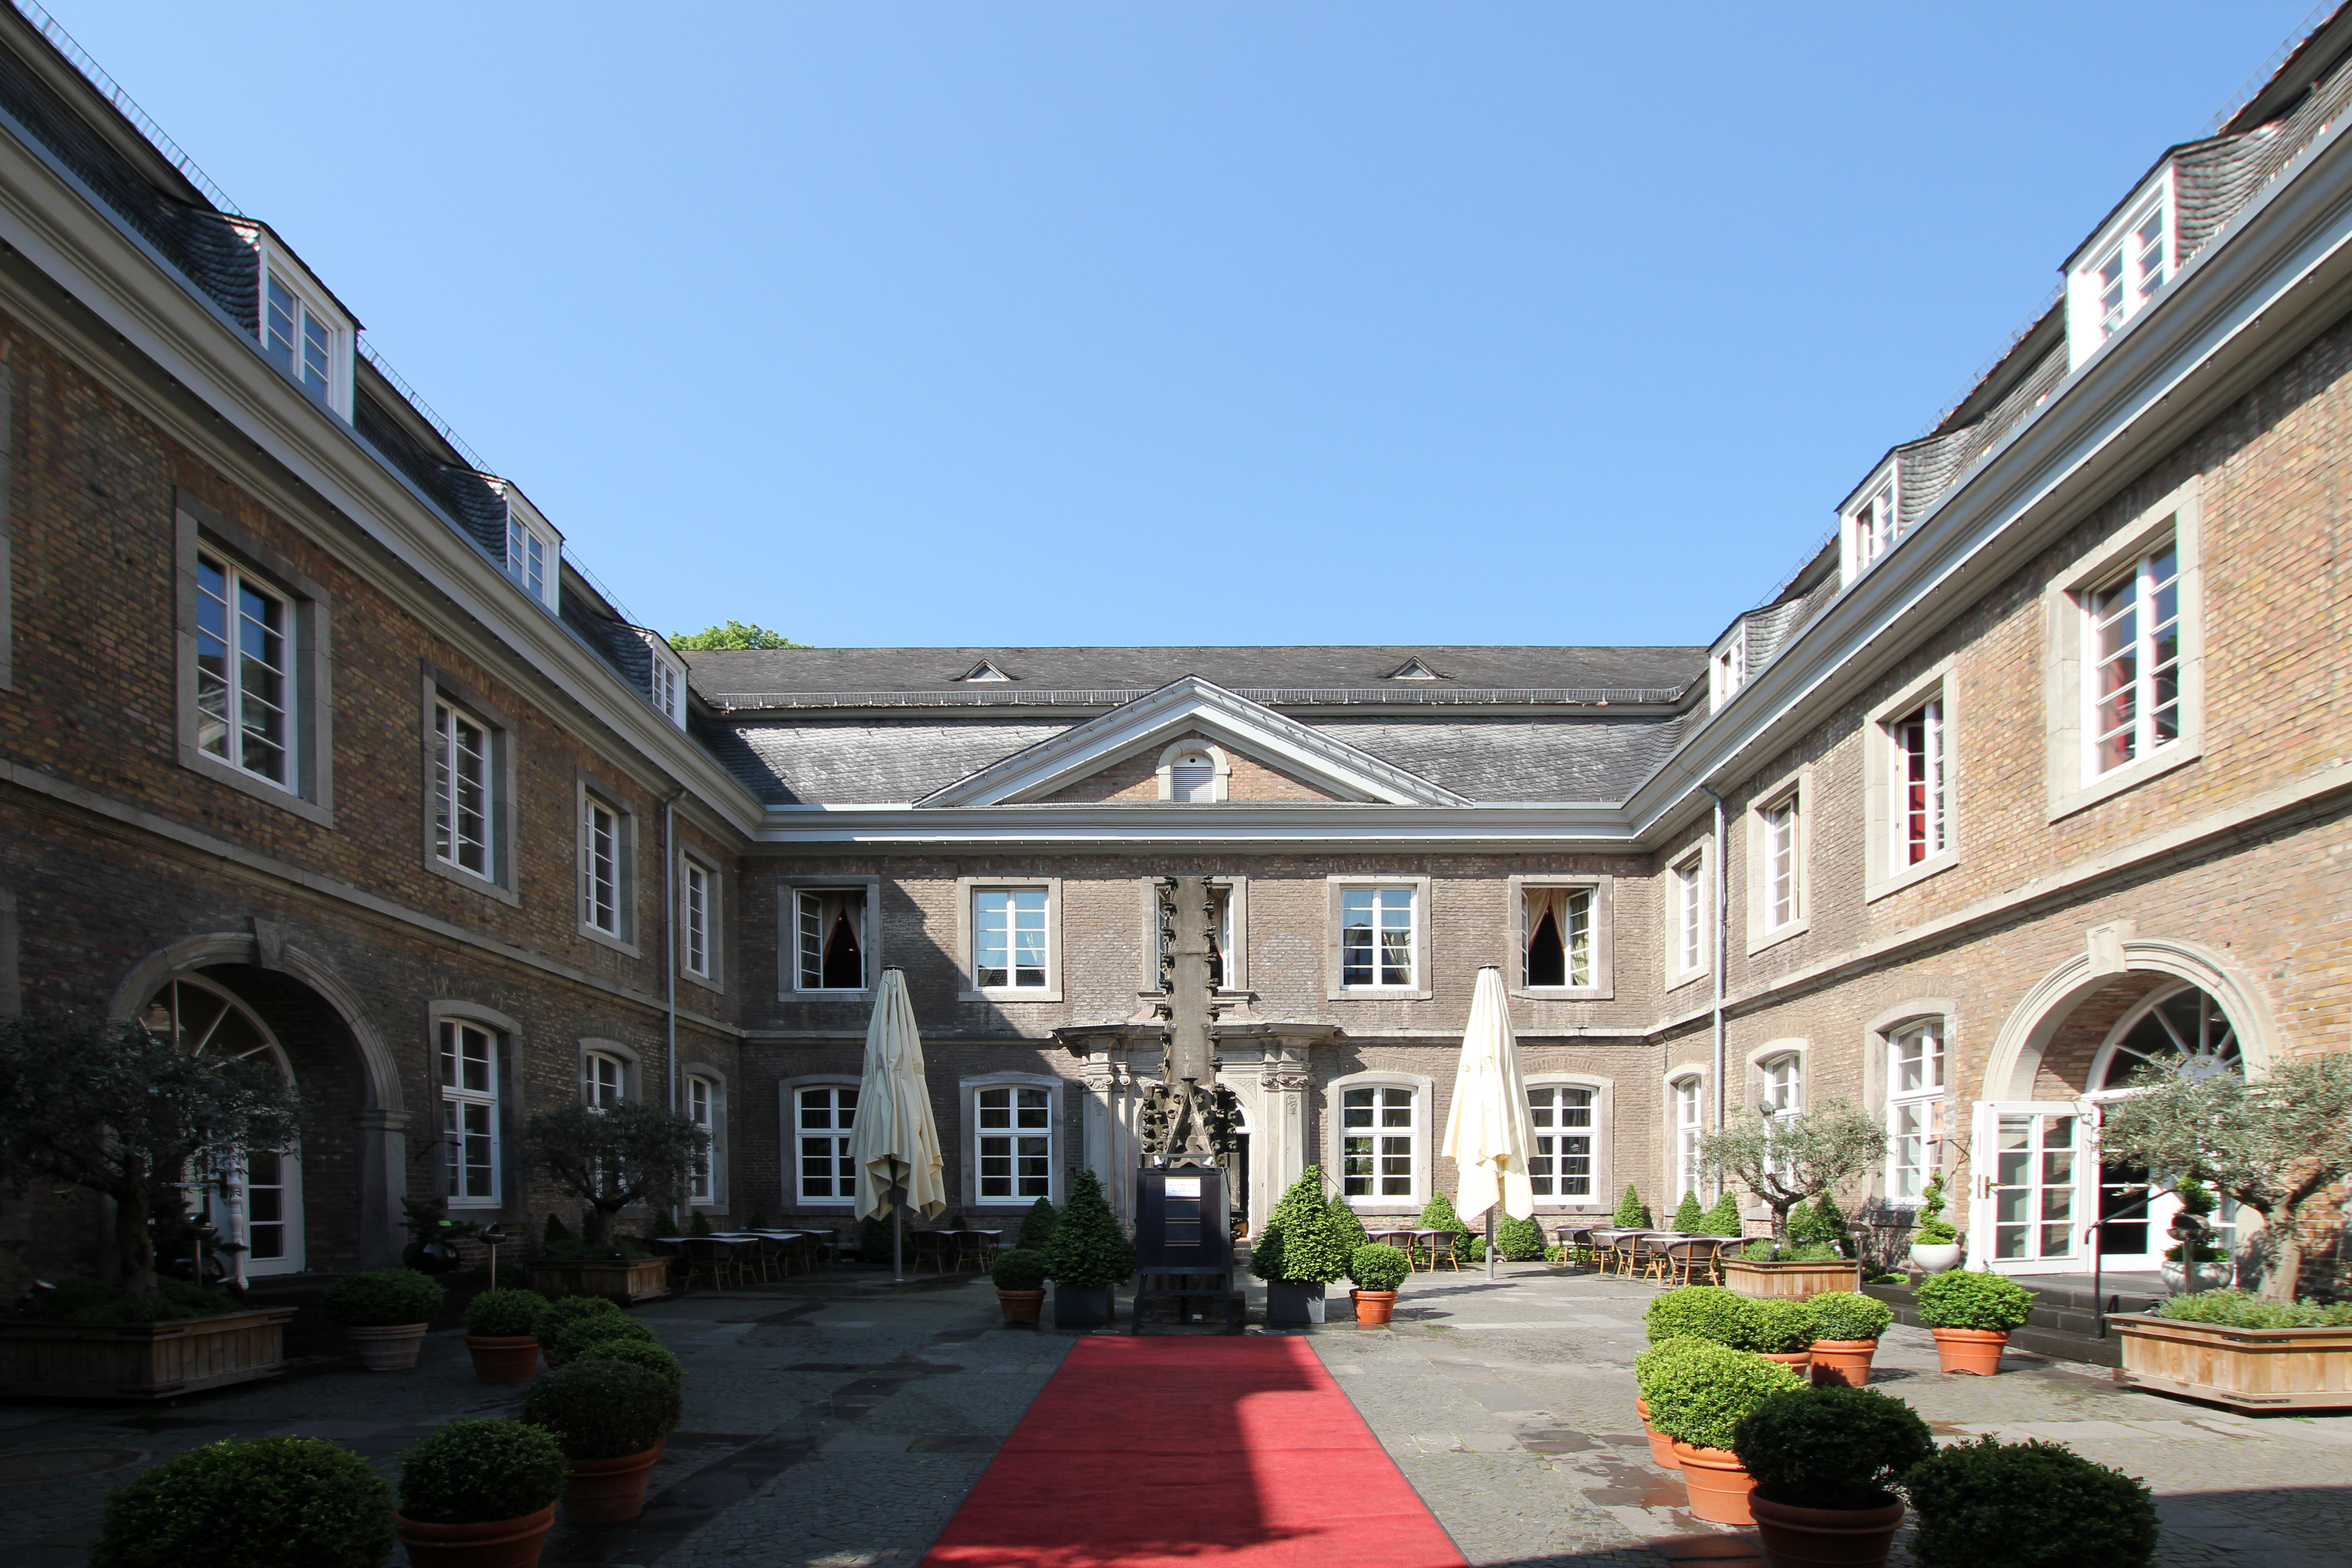 Haus Wolkenburg Innenhof Free Willy